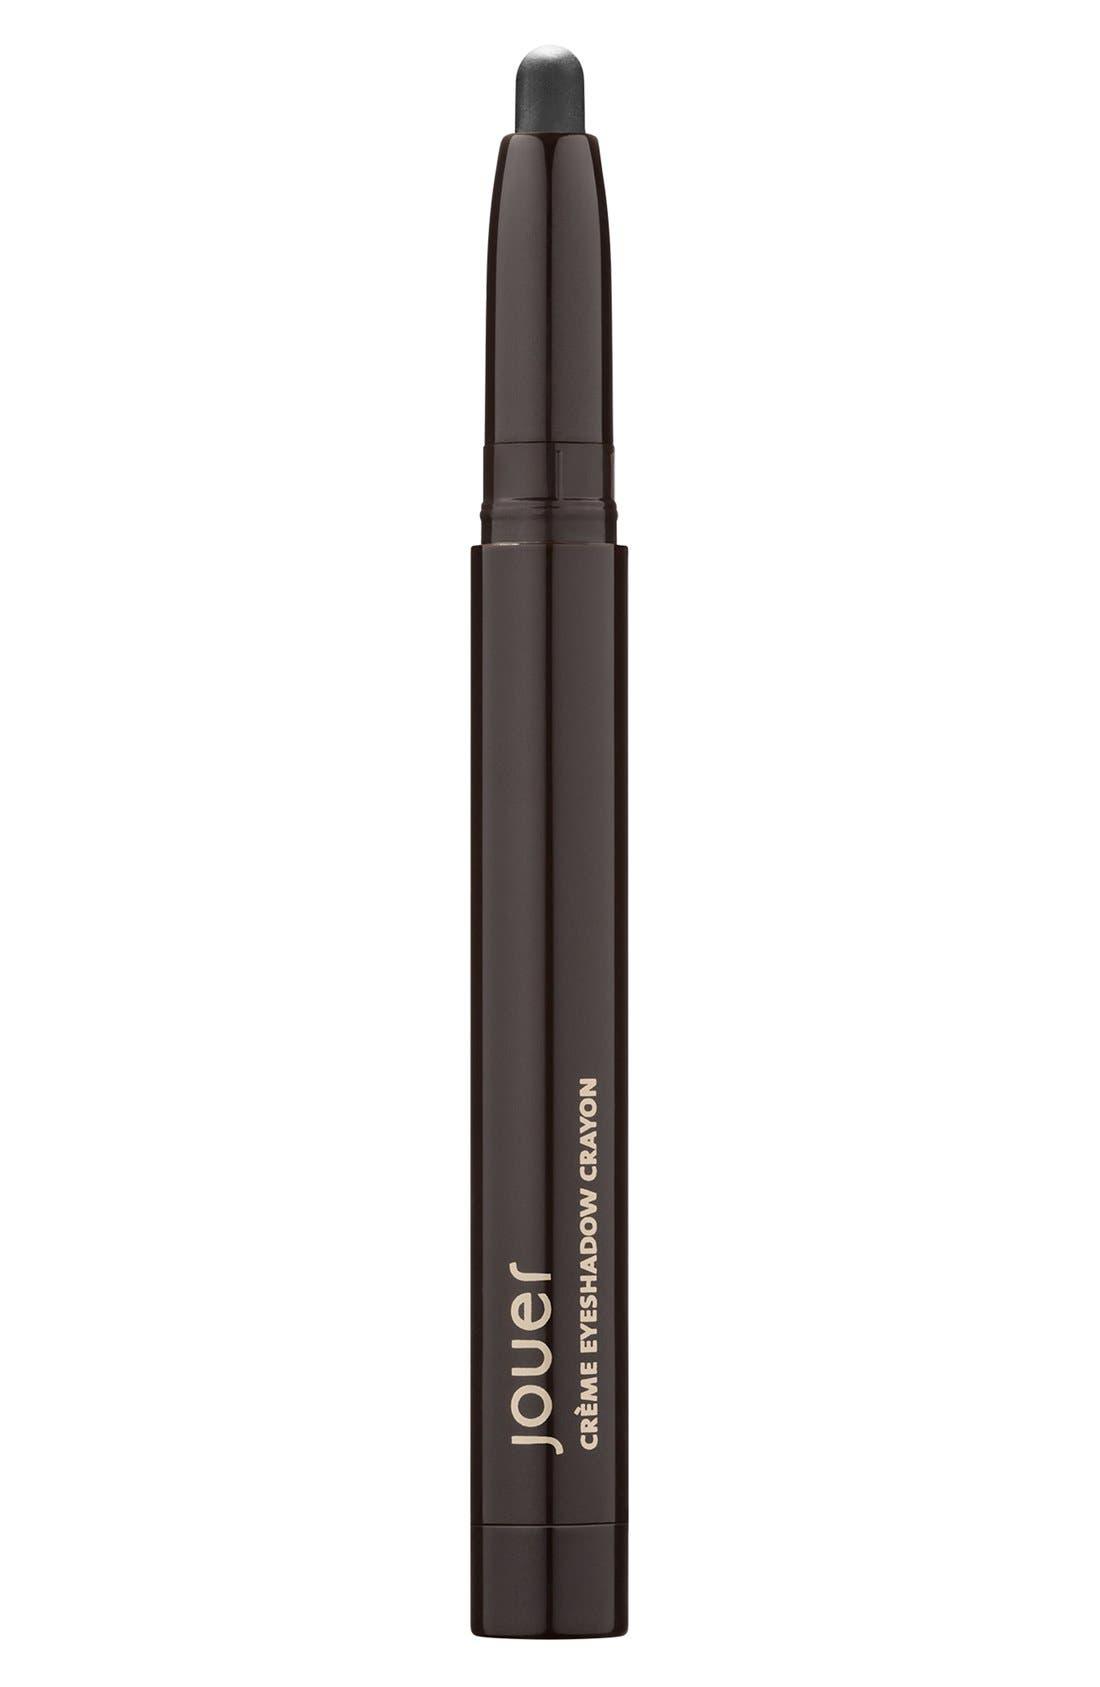 Jouer Crème Eyeshadow Crayon